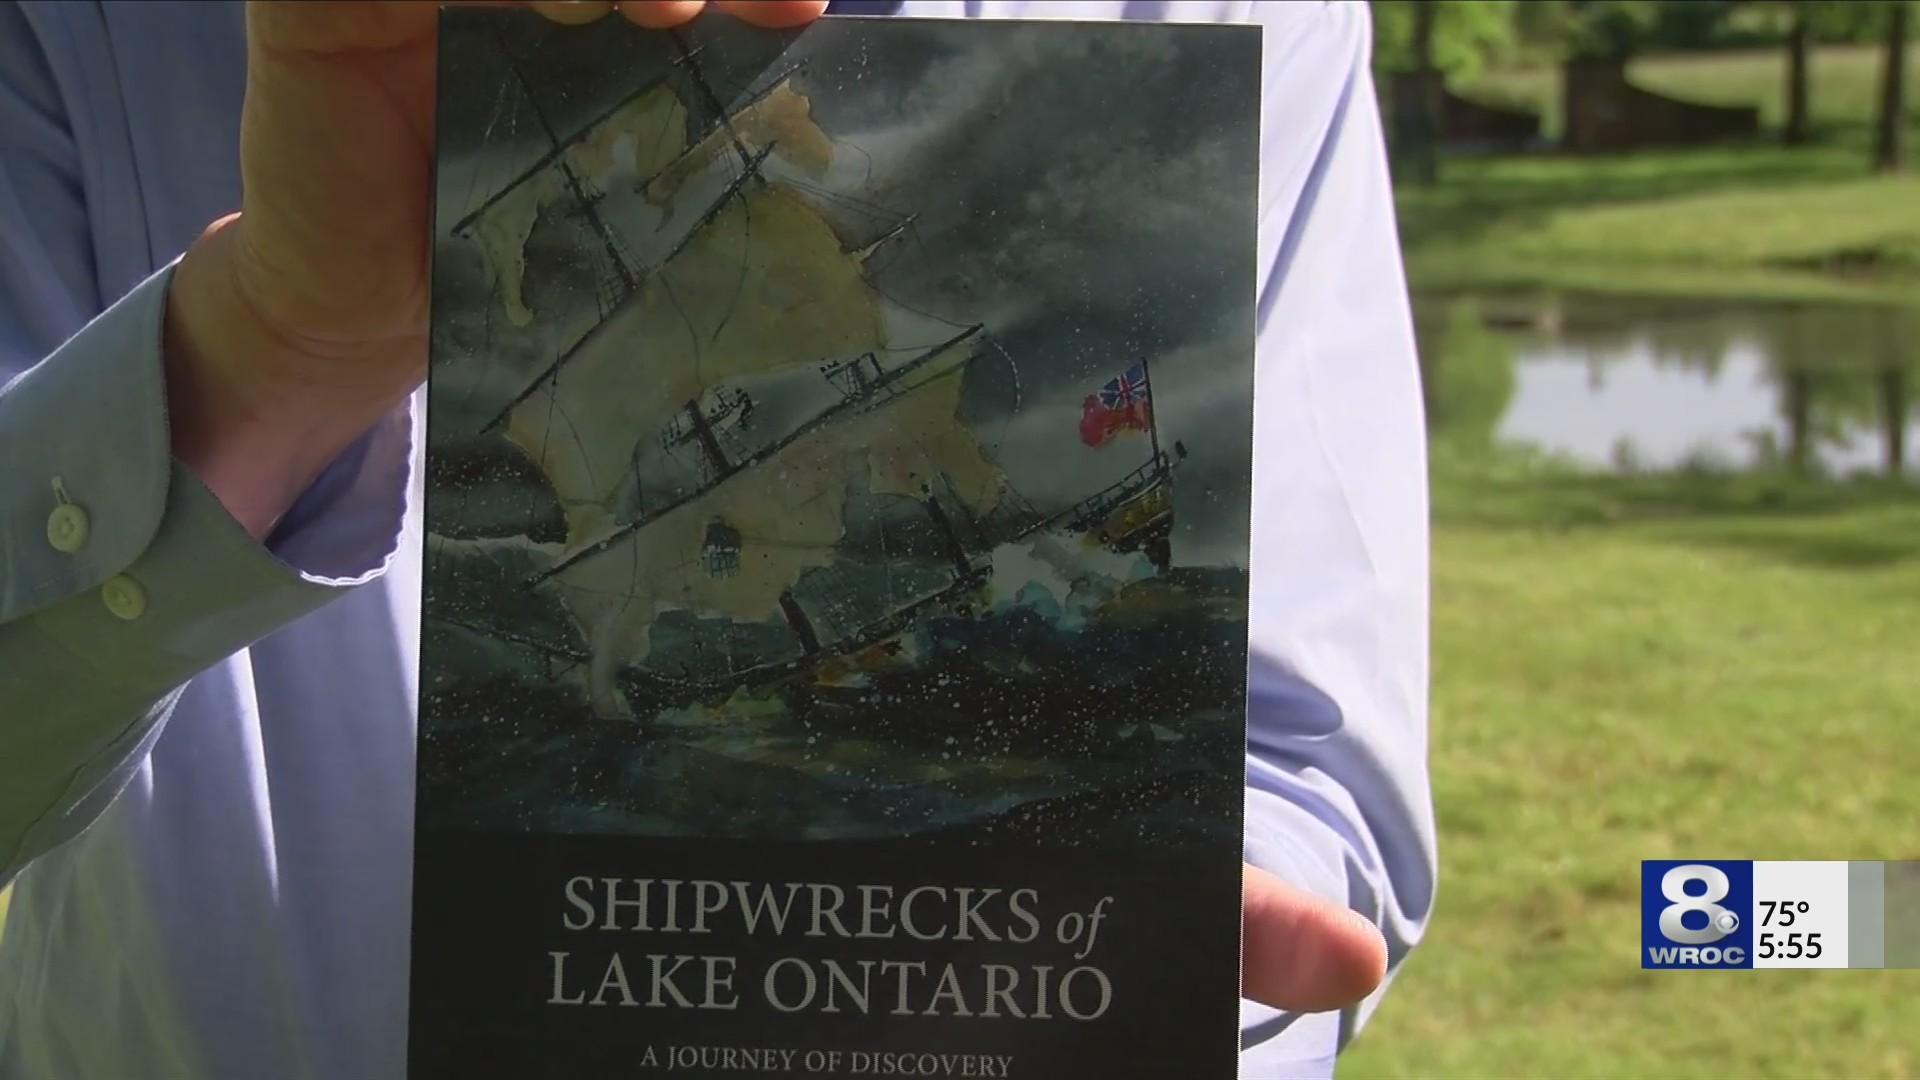 Lake Ontario shipwrecks documented in a new book